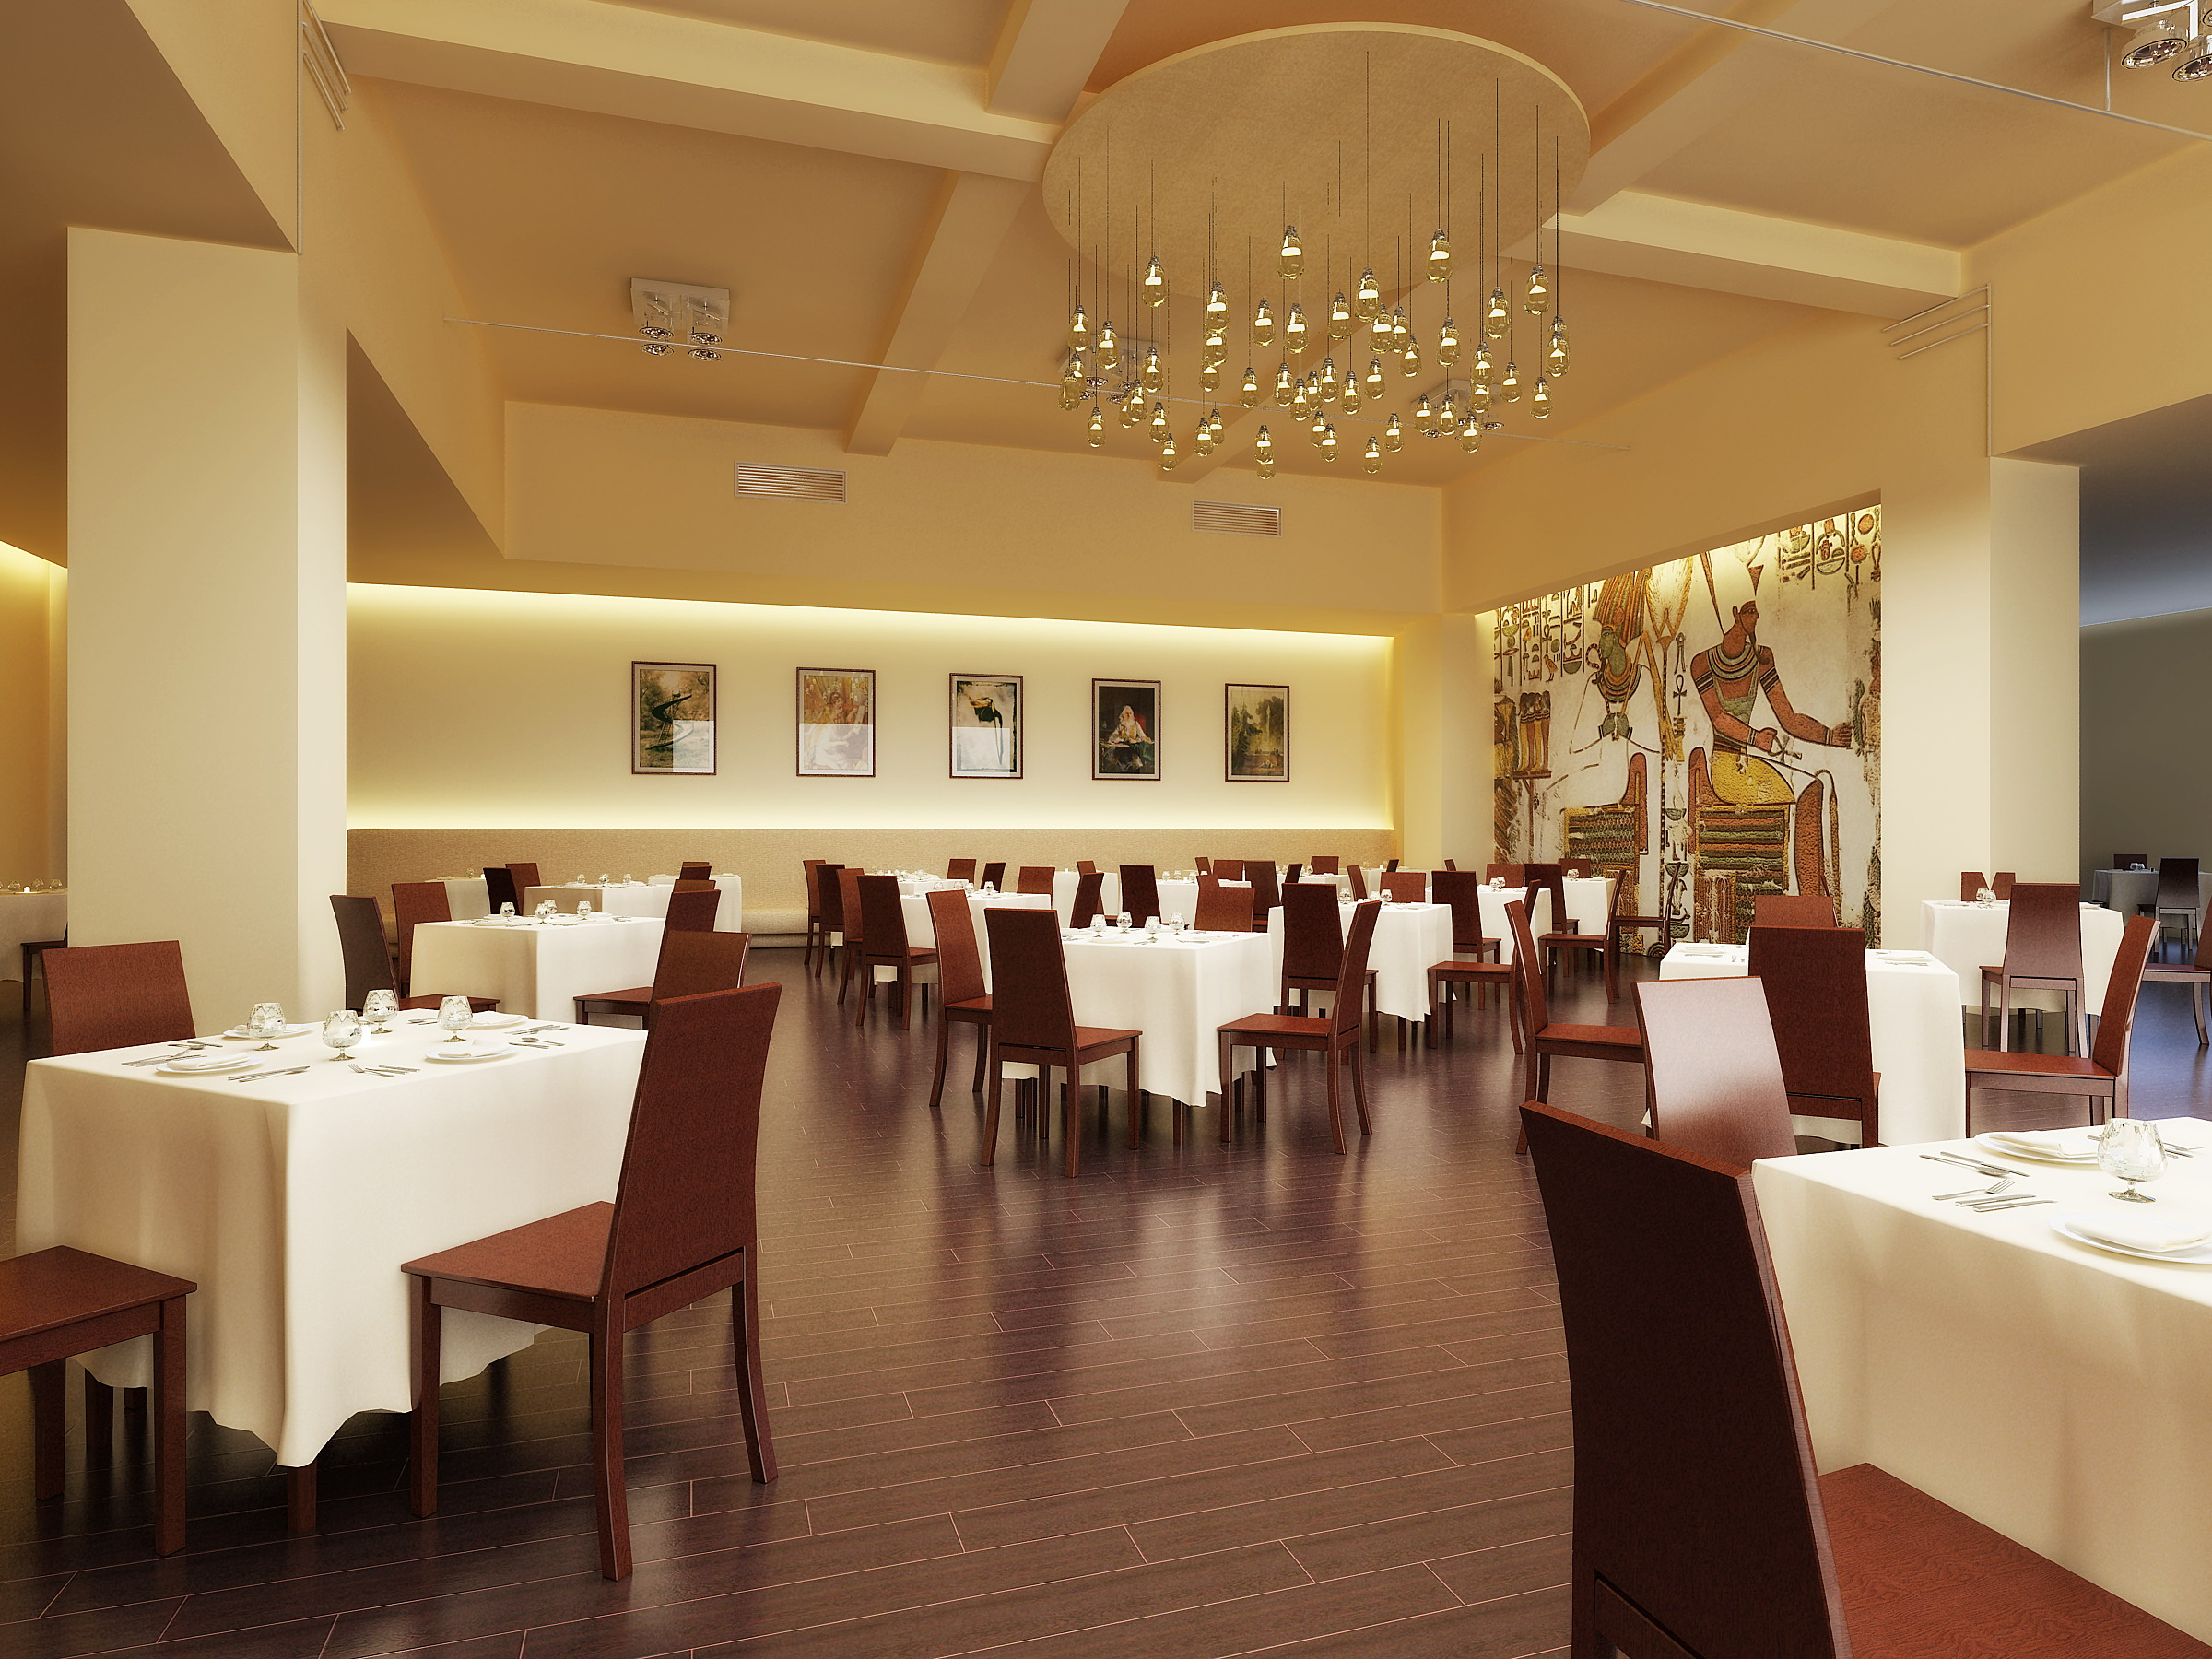 ресторан 057 3d загвар max 120176